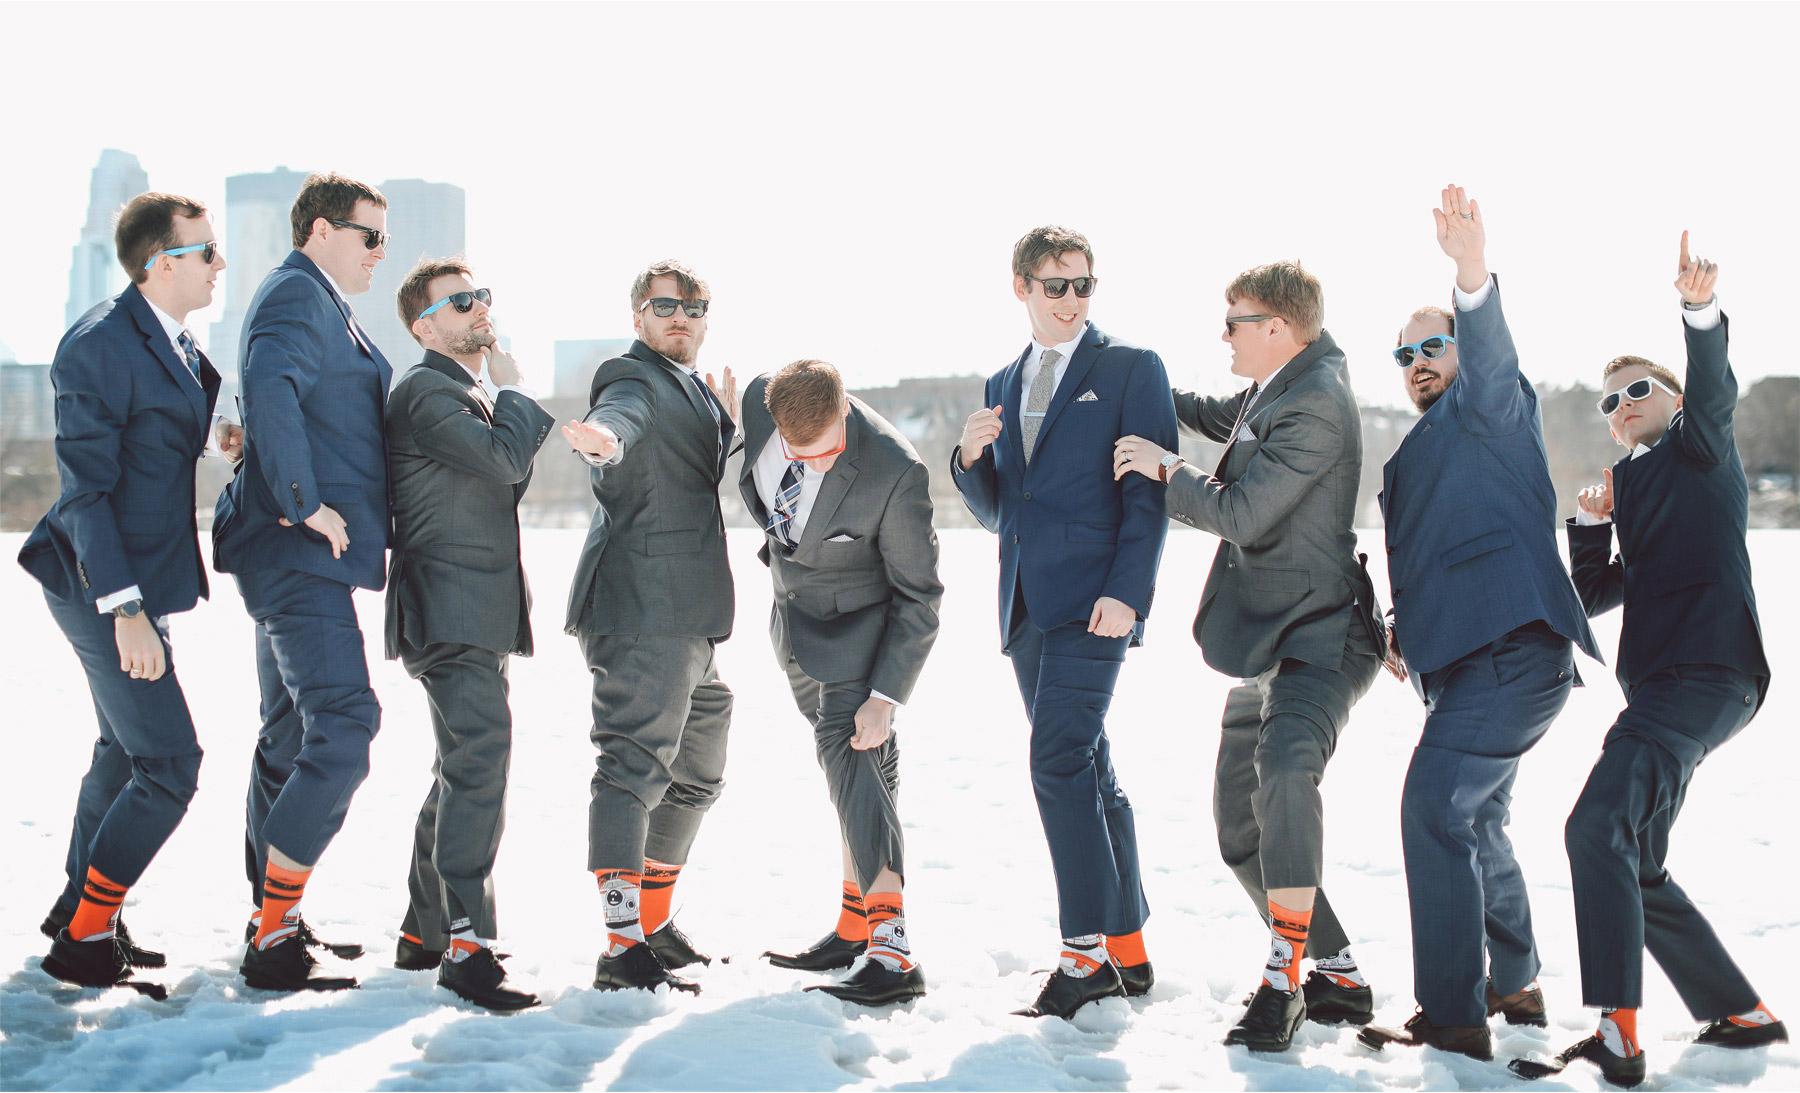 12-Minneapolis-Wedding-Photography-by-Vick-Groomsmen-Socks-Winter-Wedding-Libby-and-Nathan.jpg